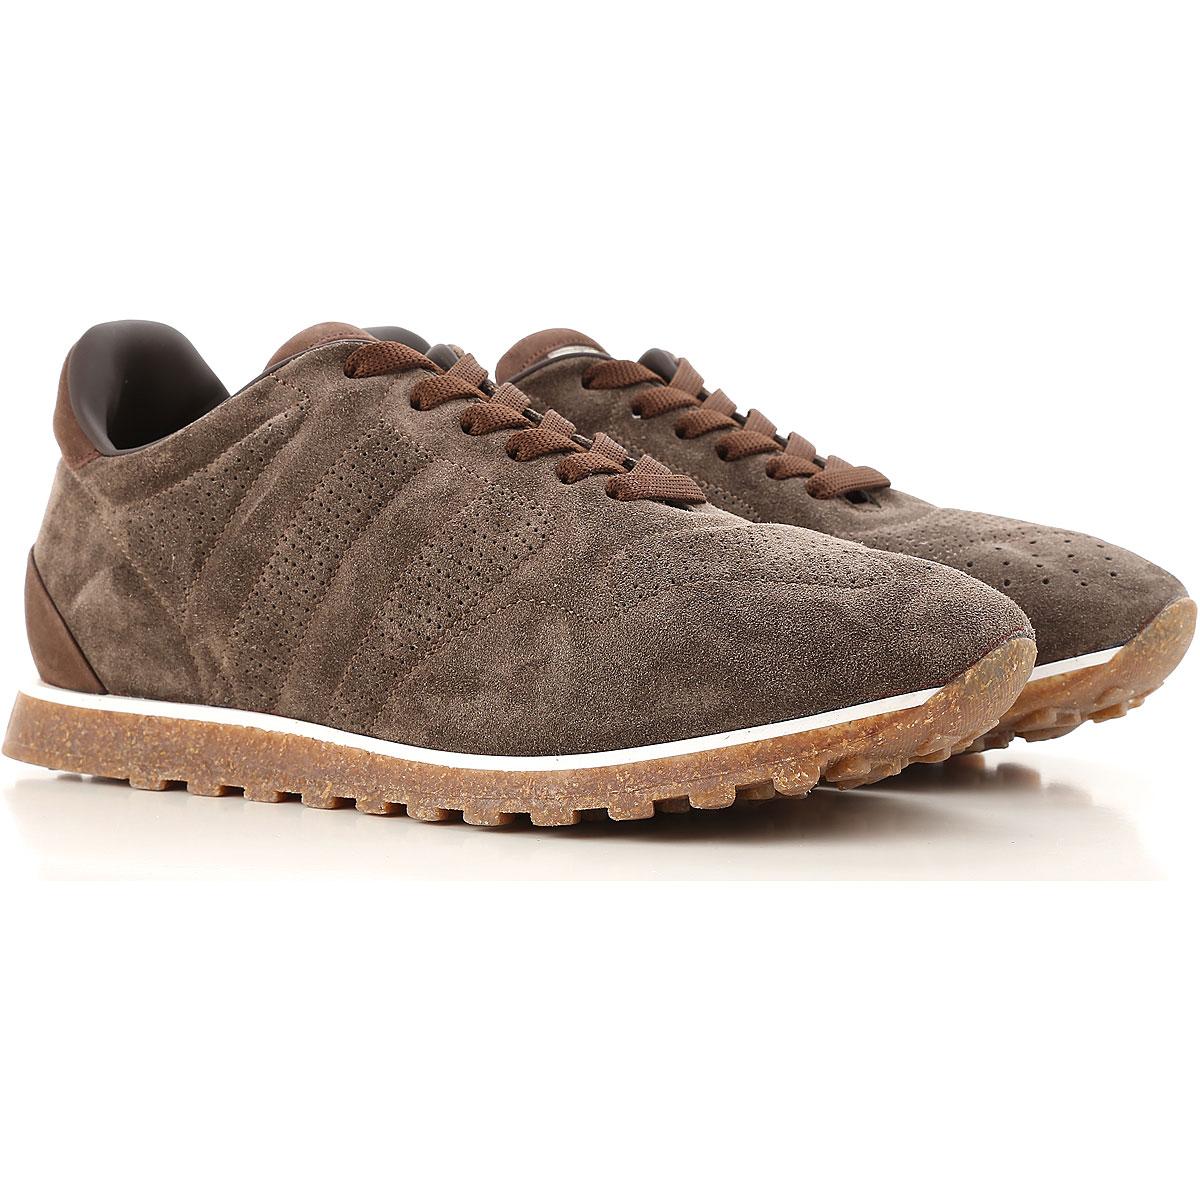 Alberto Fasciani Sneaker Homme Pas cher en Soldes, Marron, Daim, 2017, 39.5 42